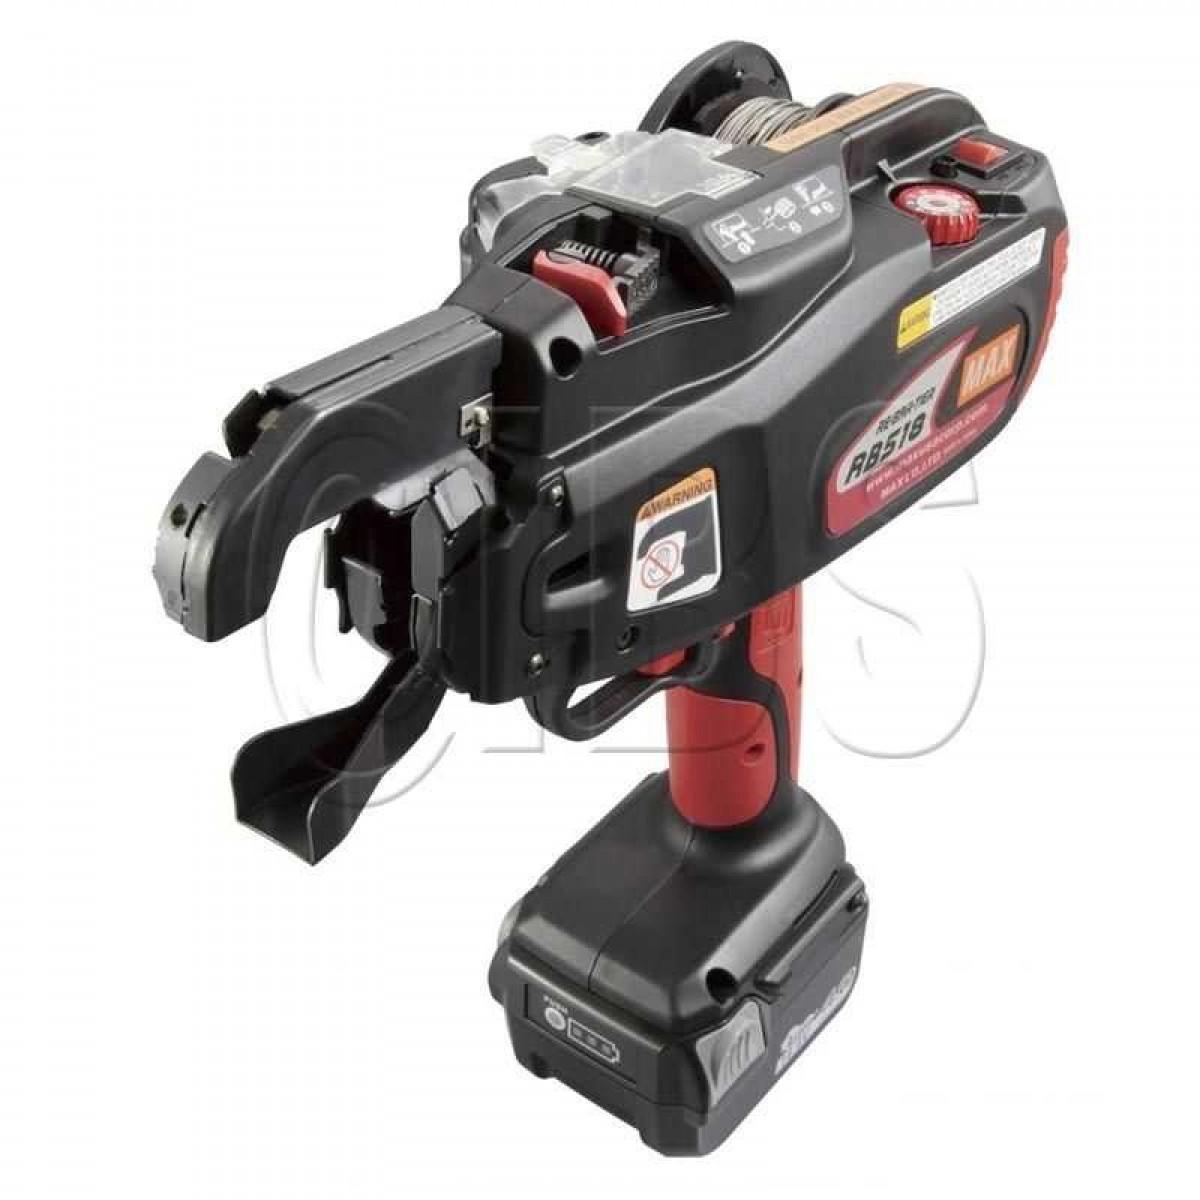 31e039a3dd05 ... Max USA Rebar-Tier RB518 Cordless Rebar Tying Tool ...